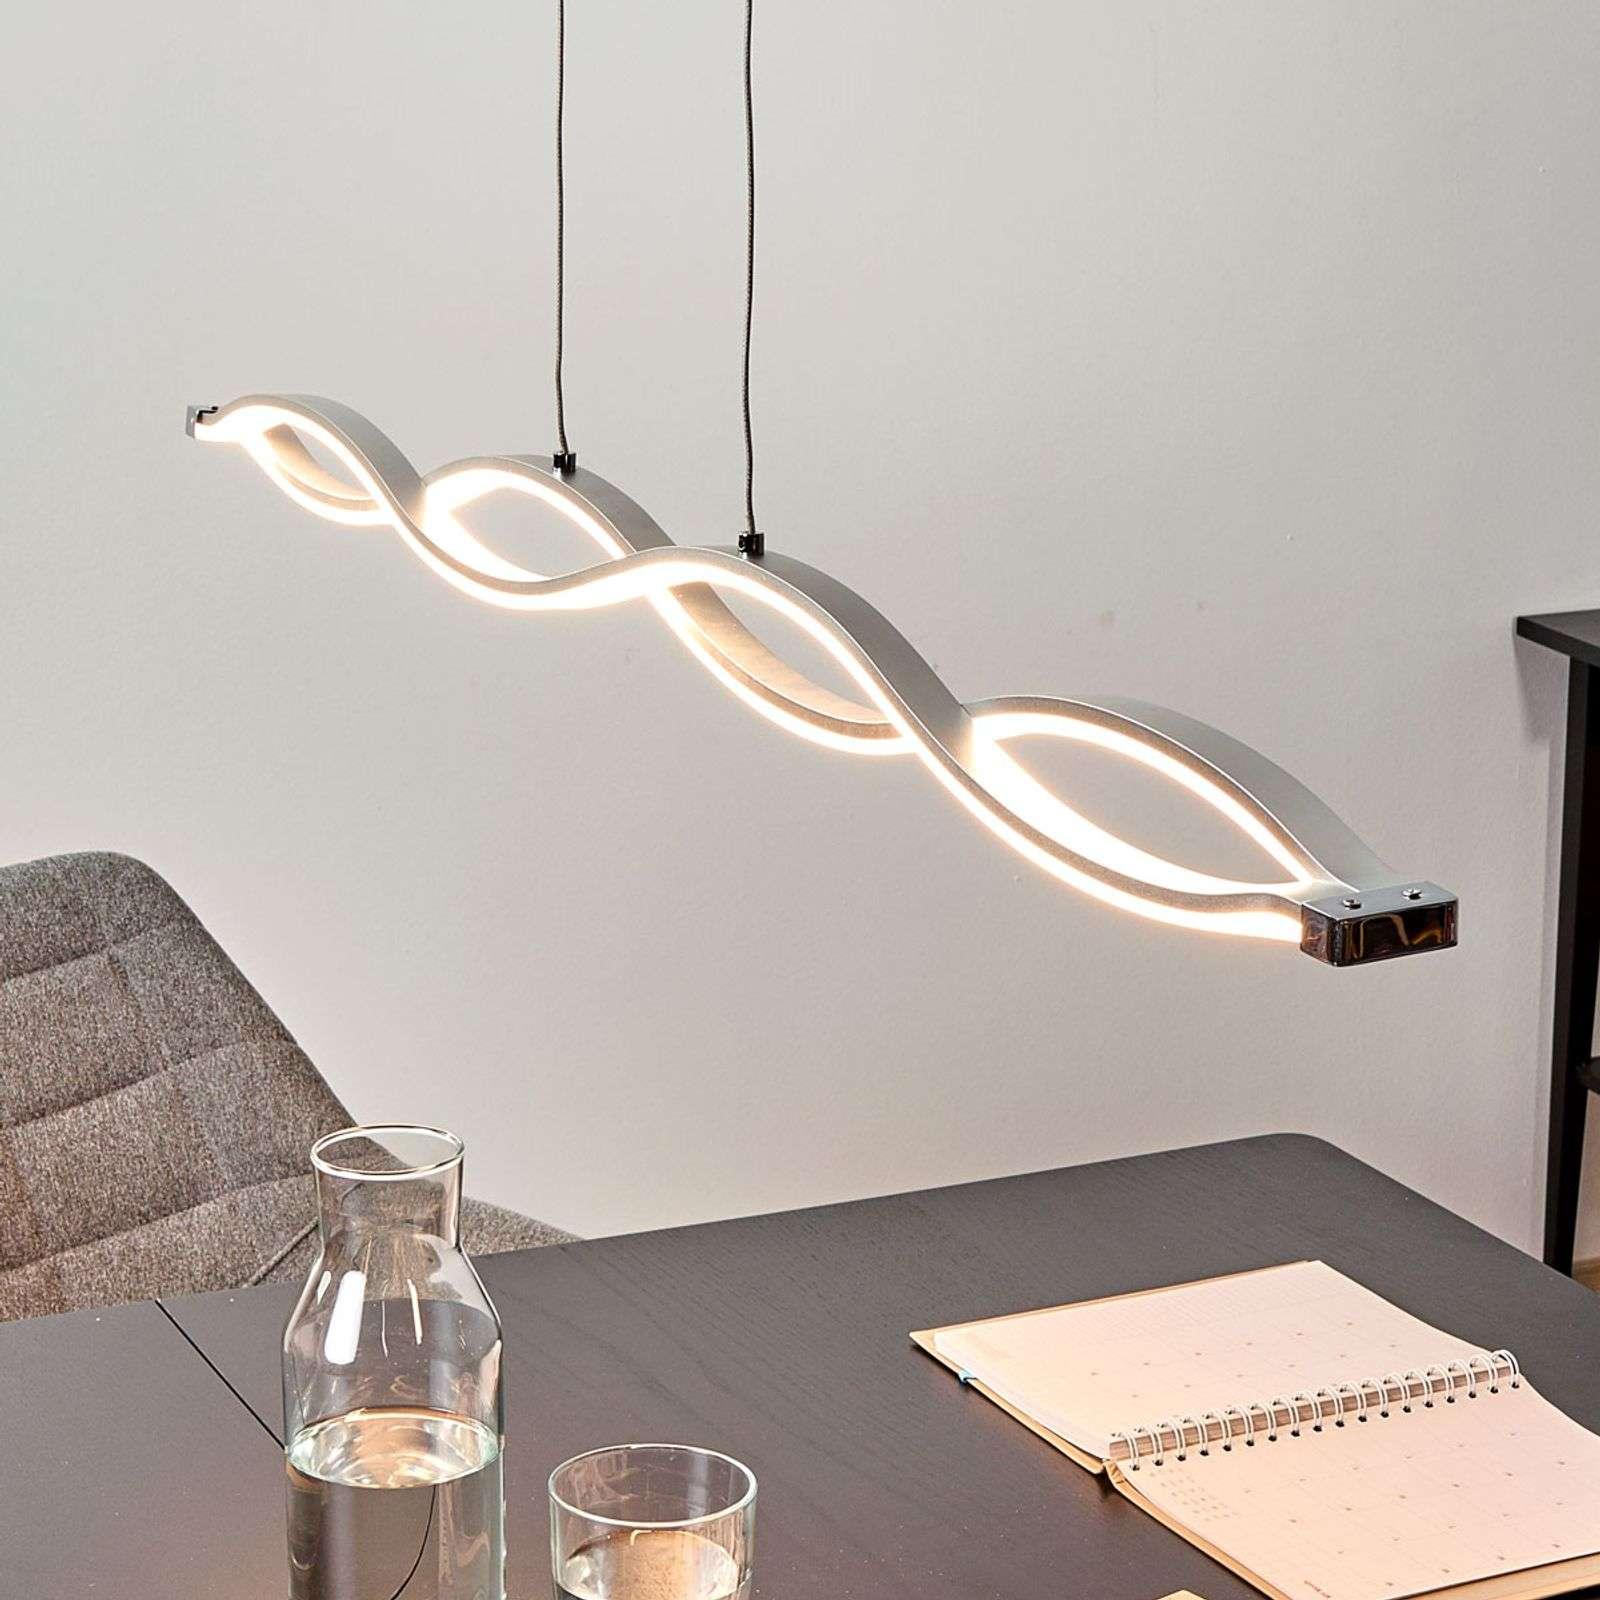 Lampenwelt.com Suspension en forme de vague Tura LED vives - LAMPENWELT.com